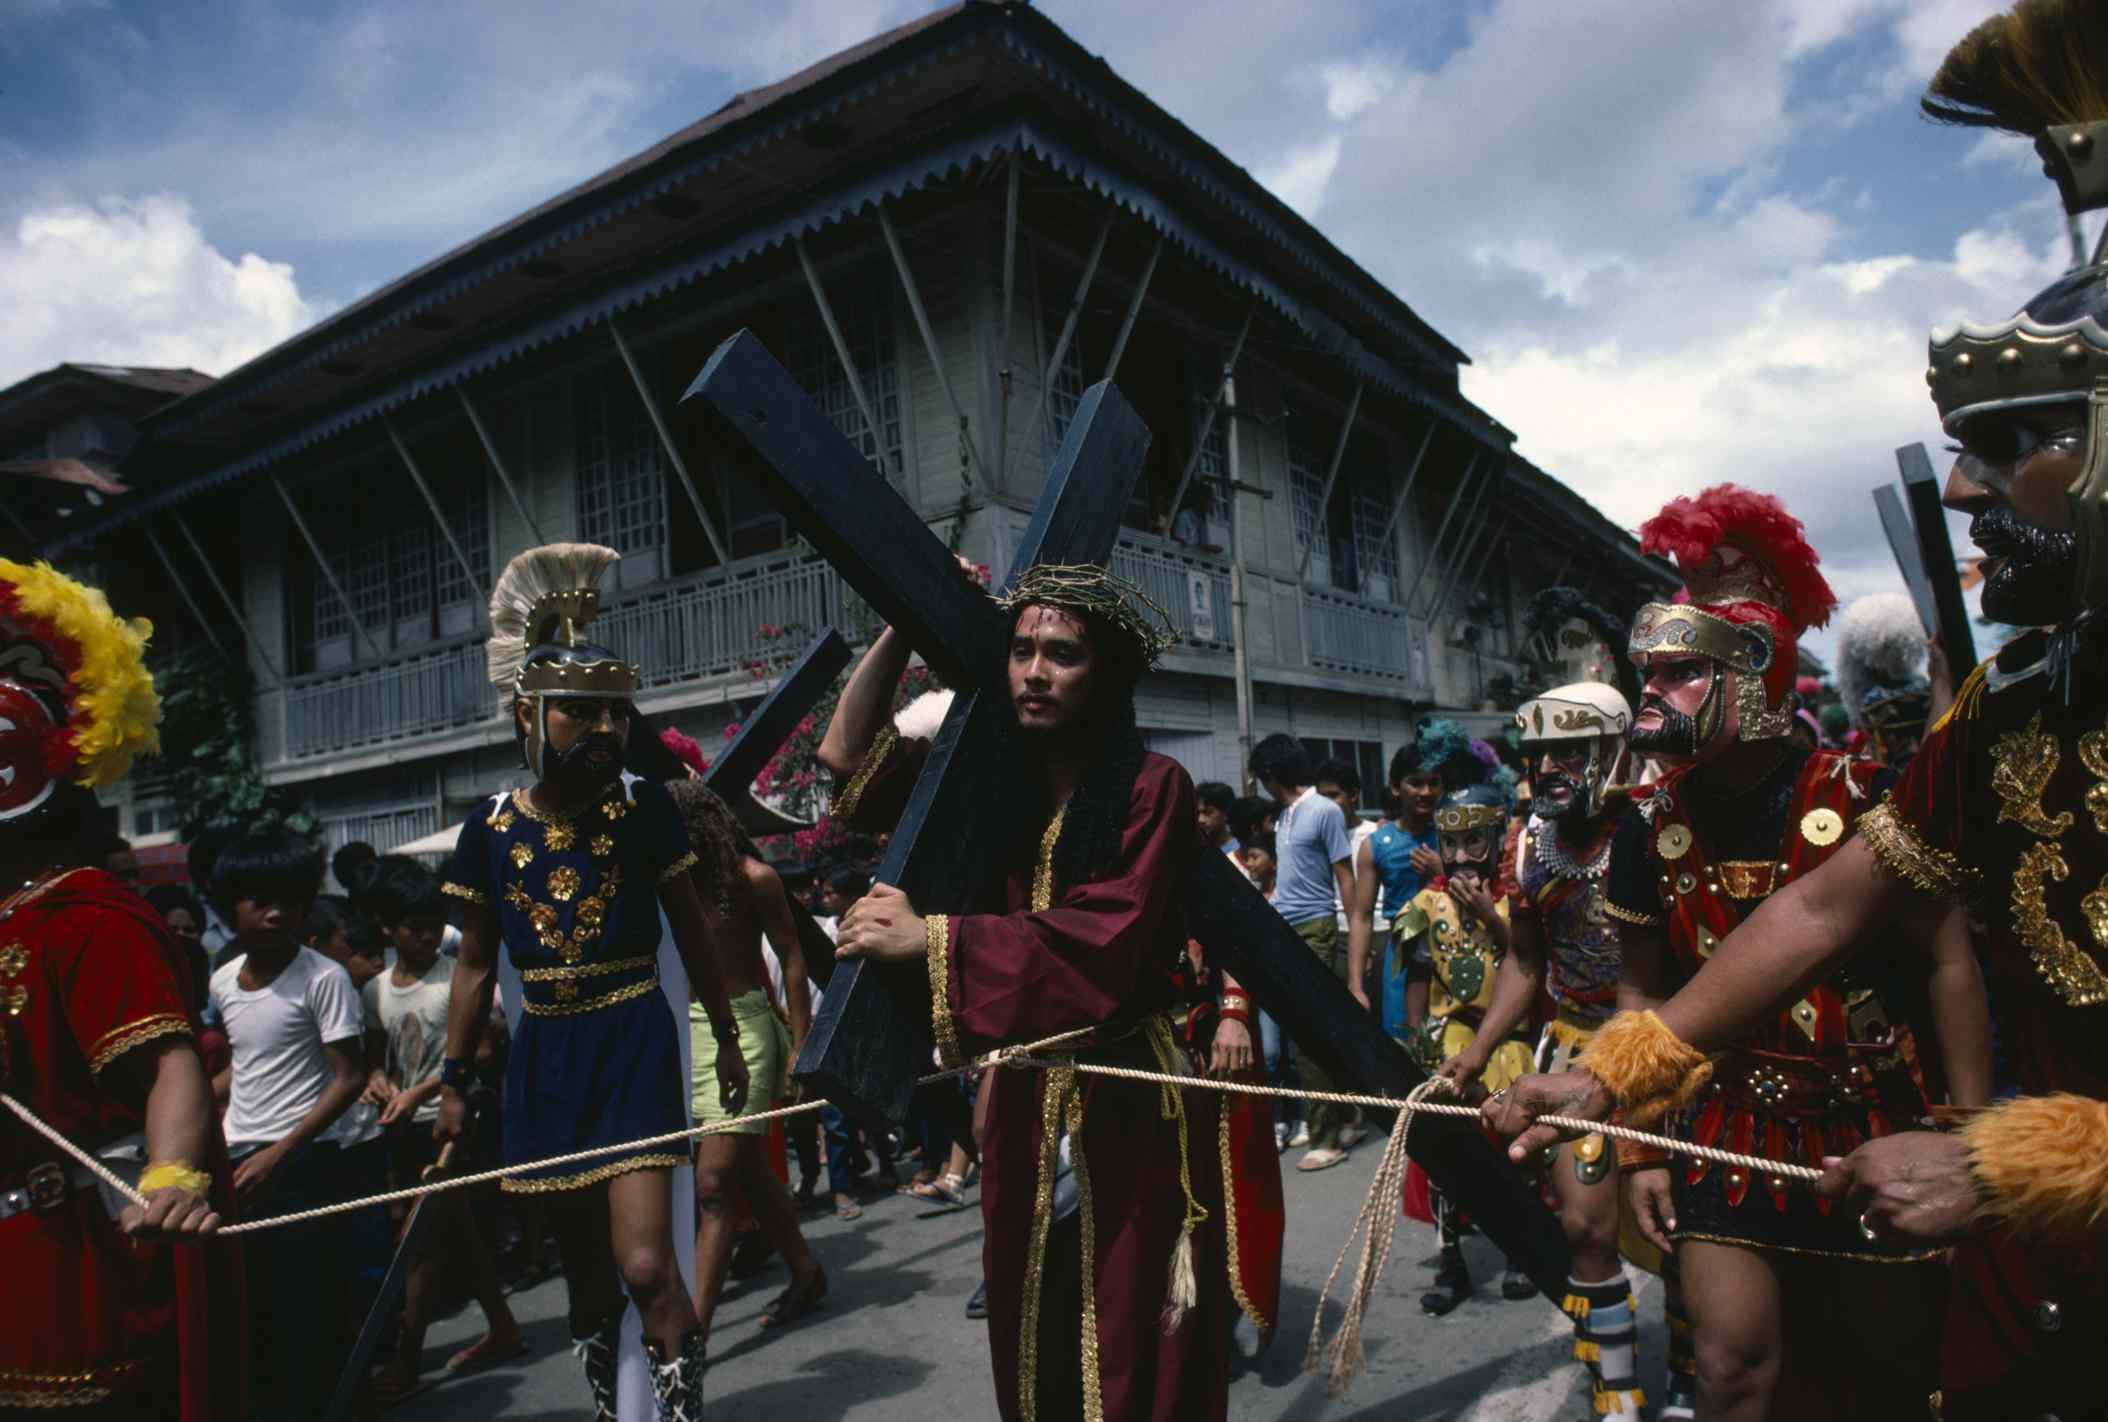 Moriones Festival parade, Philippines